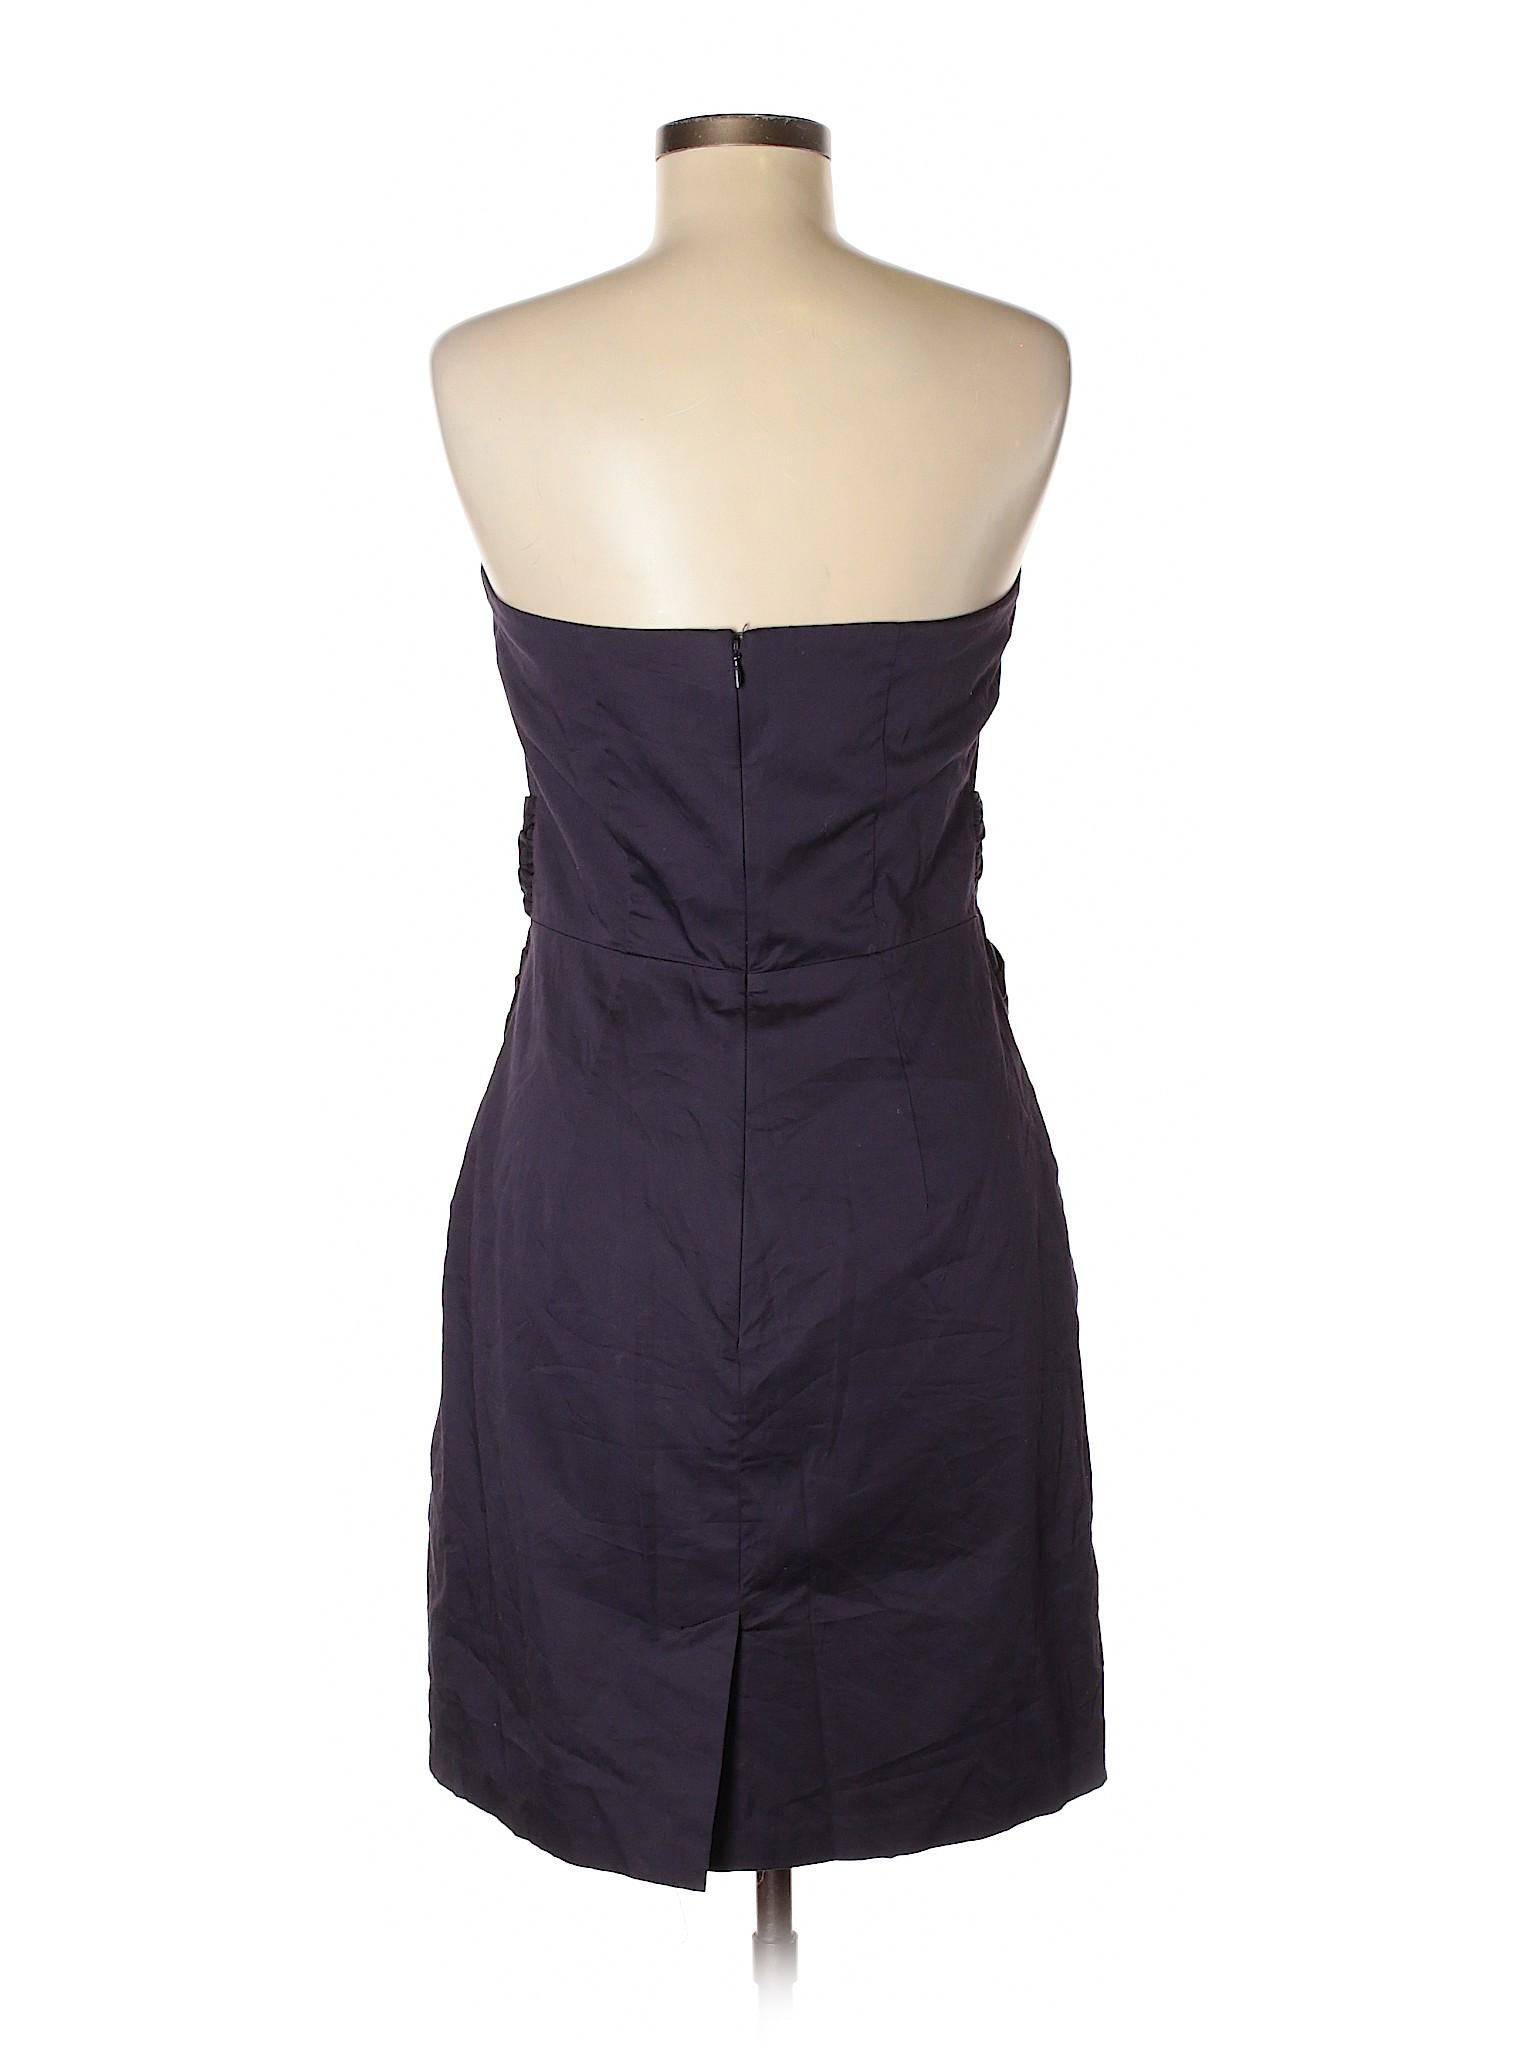 Selling The Limited Selling Limited Limited The Dress Casual Dress Dress The Casual Selling Casual Selling Rqp4qSrX